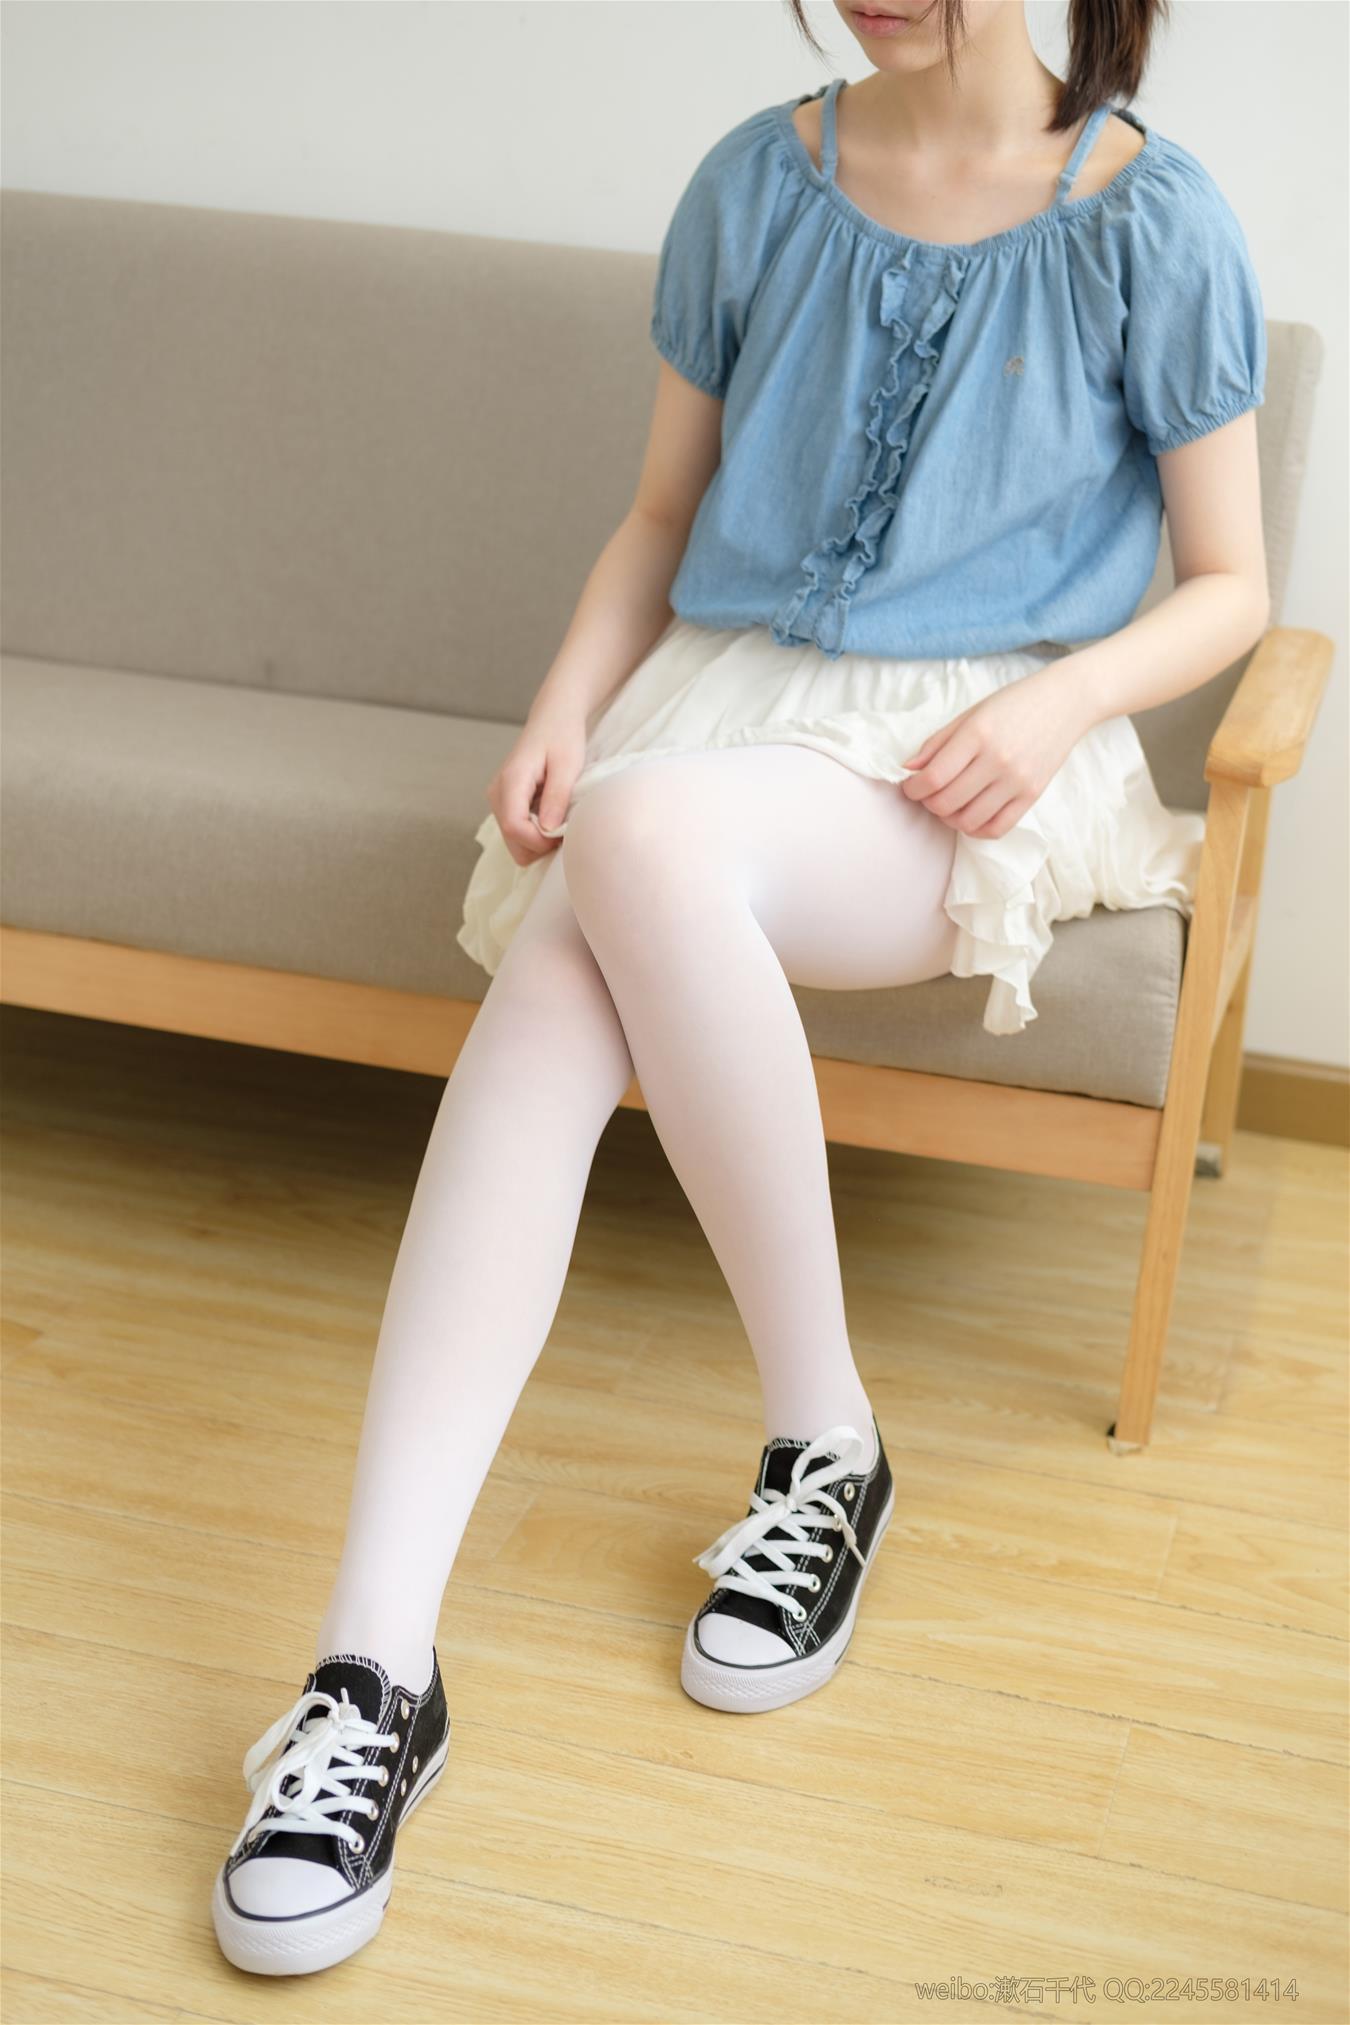 轻兰映画 Blue and White [129P-698MB] 轻兰映画-第3张